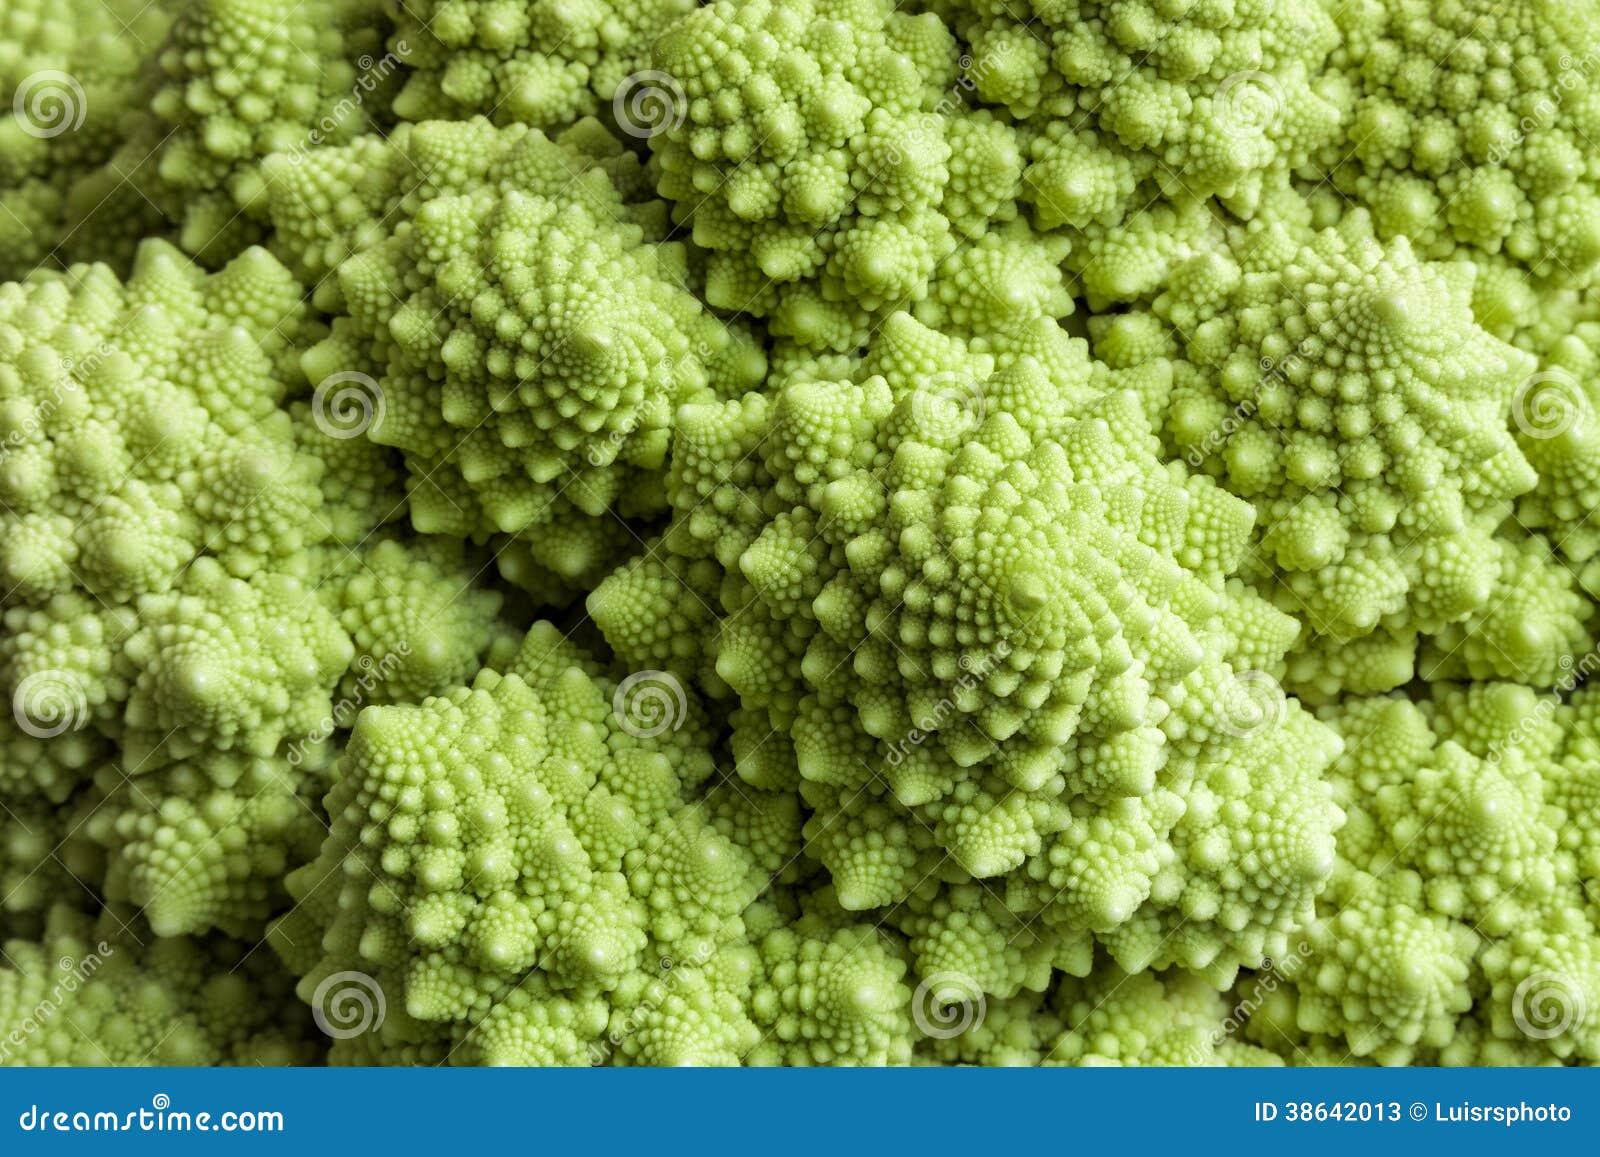 Mathematics In Nature Stock Photos - Image: 38642013